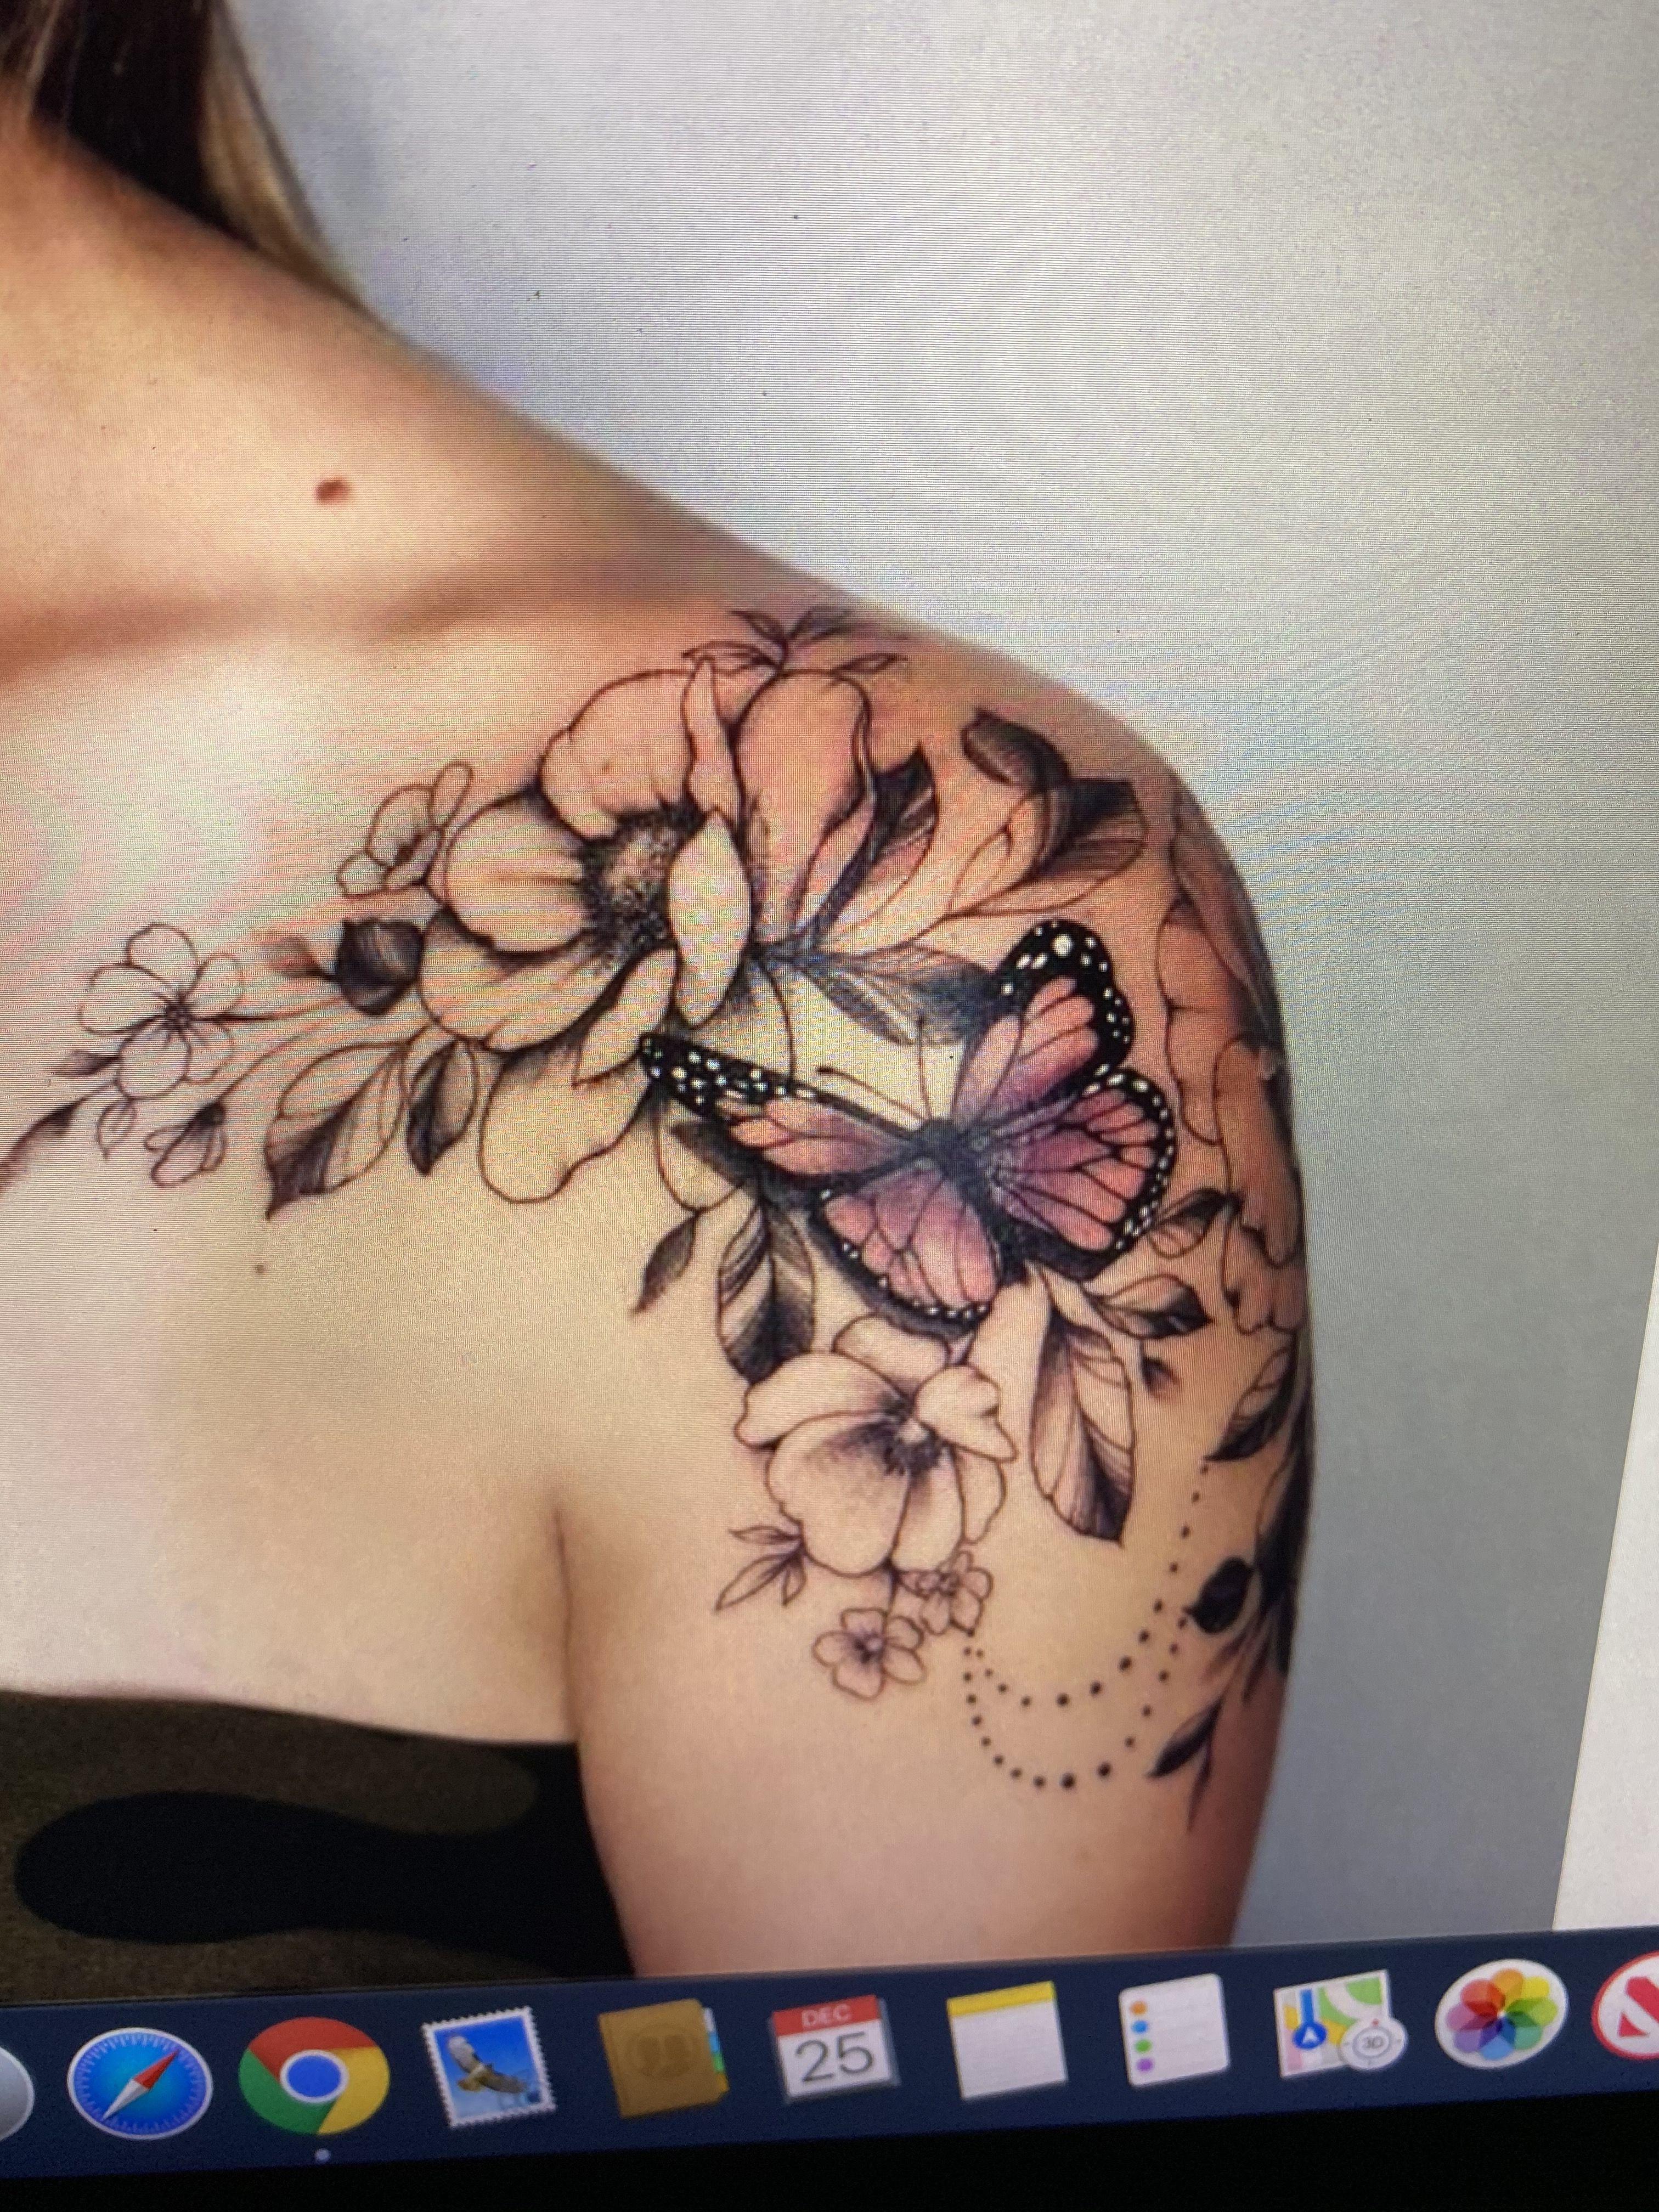 Pin by Joelle Medeiros Lilavois on Tattoos Tattoos